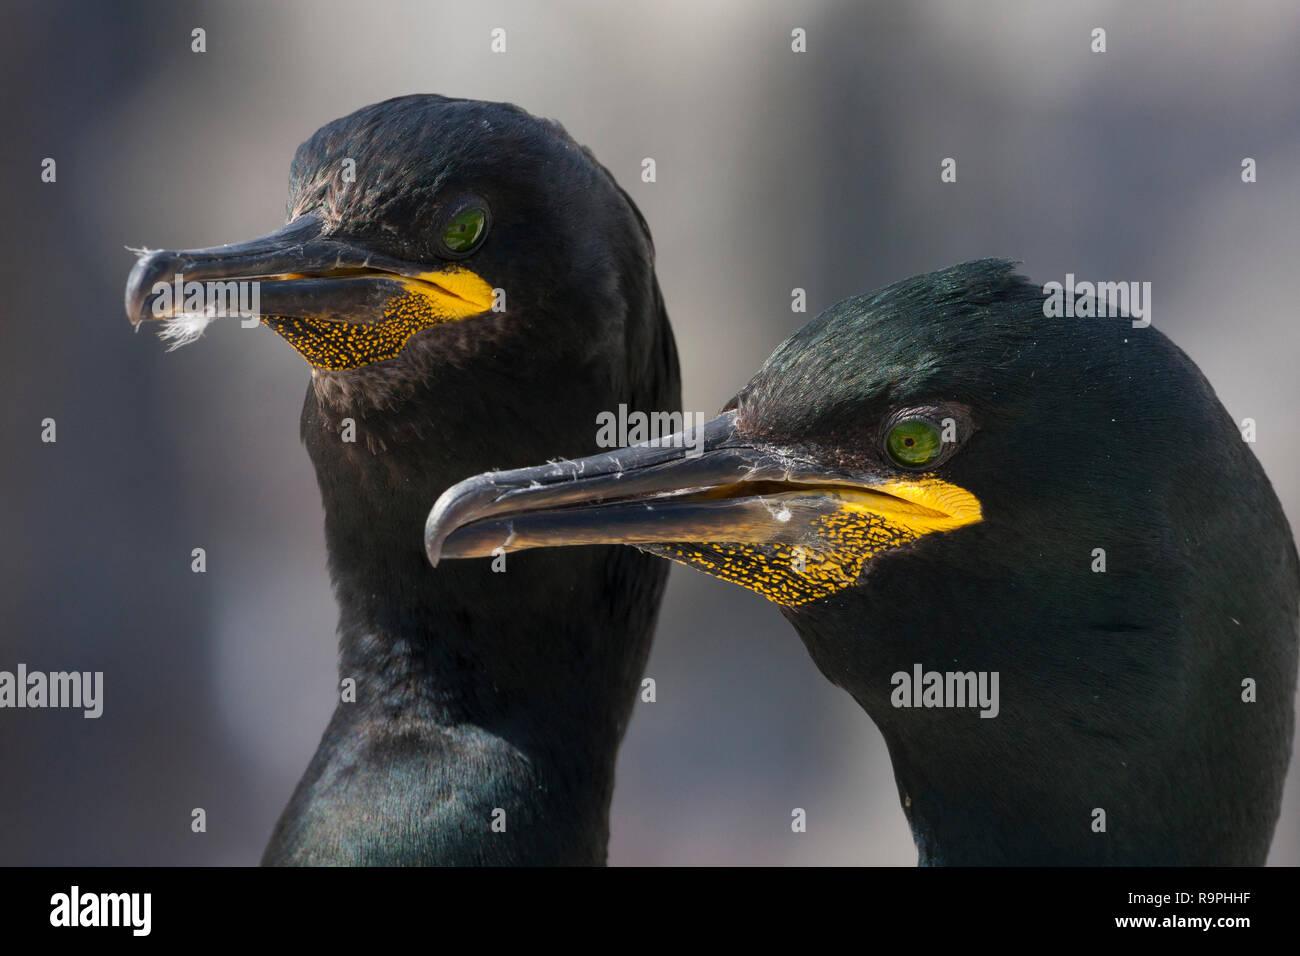 European Shag (Phalacrocorax aristotelis), close-up of two adults - Stock Image